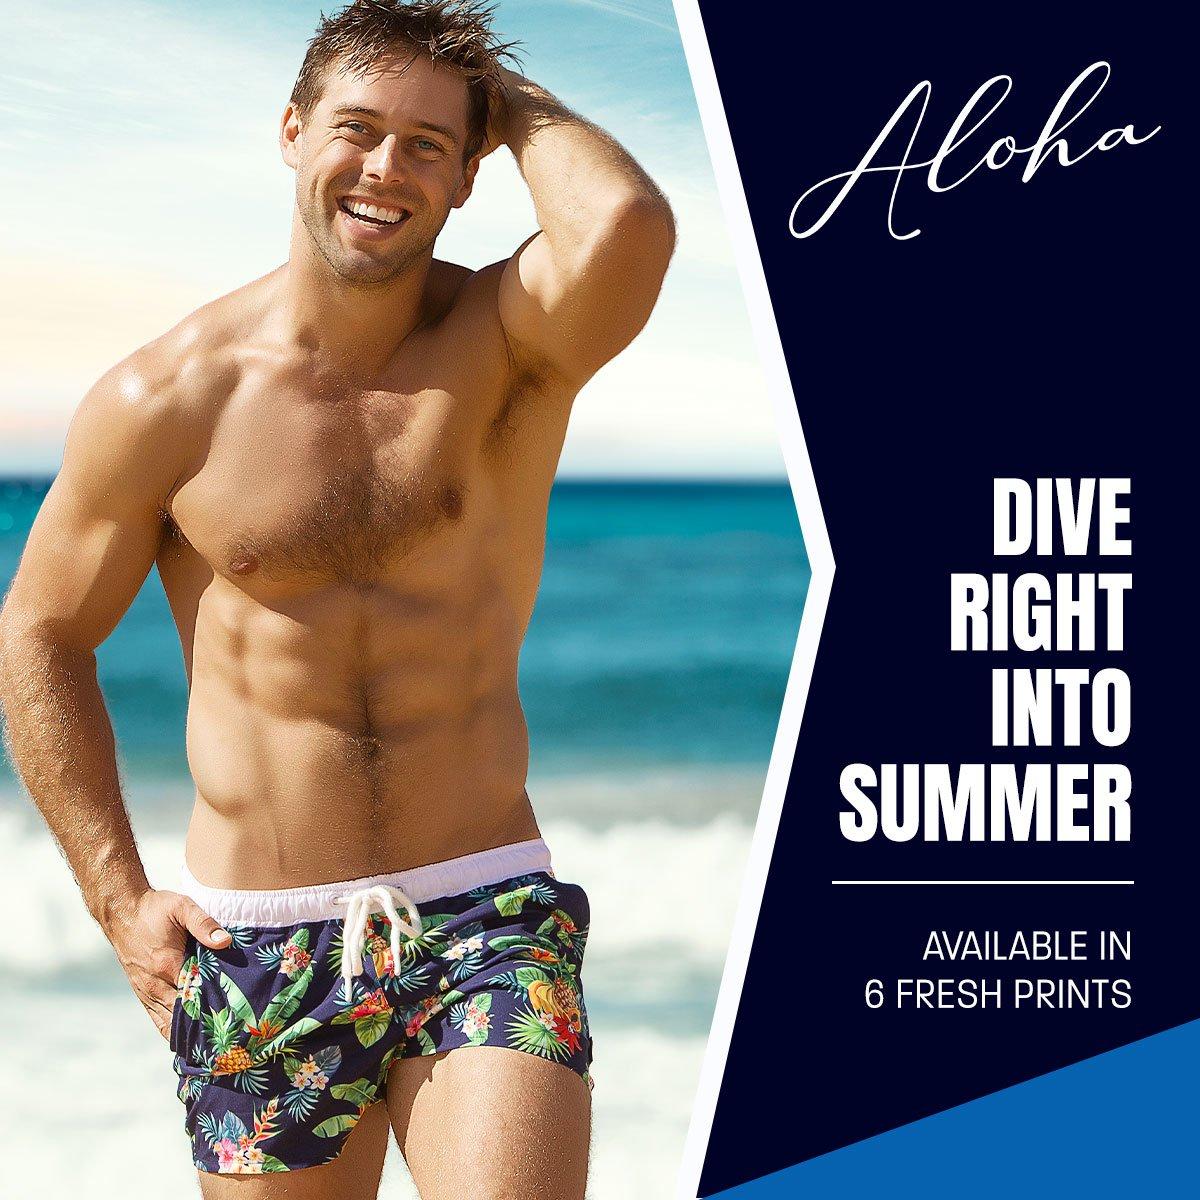 Aloha Navy Homepage Image